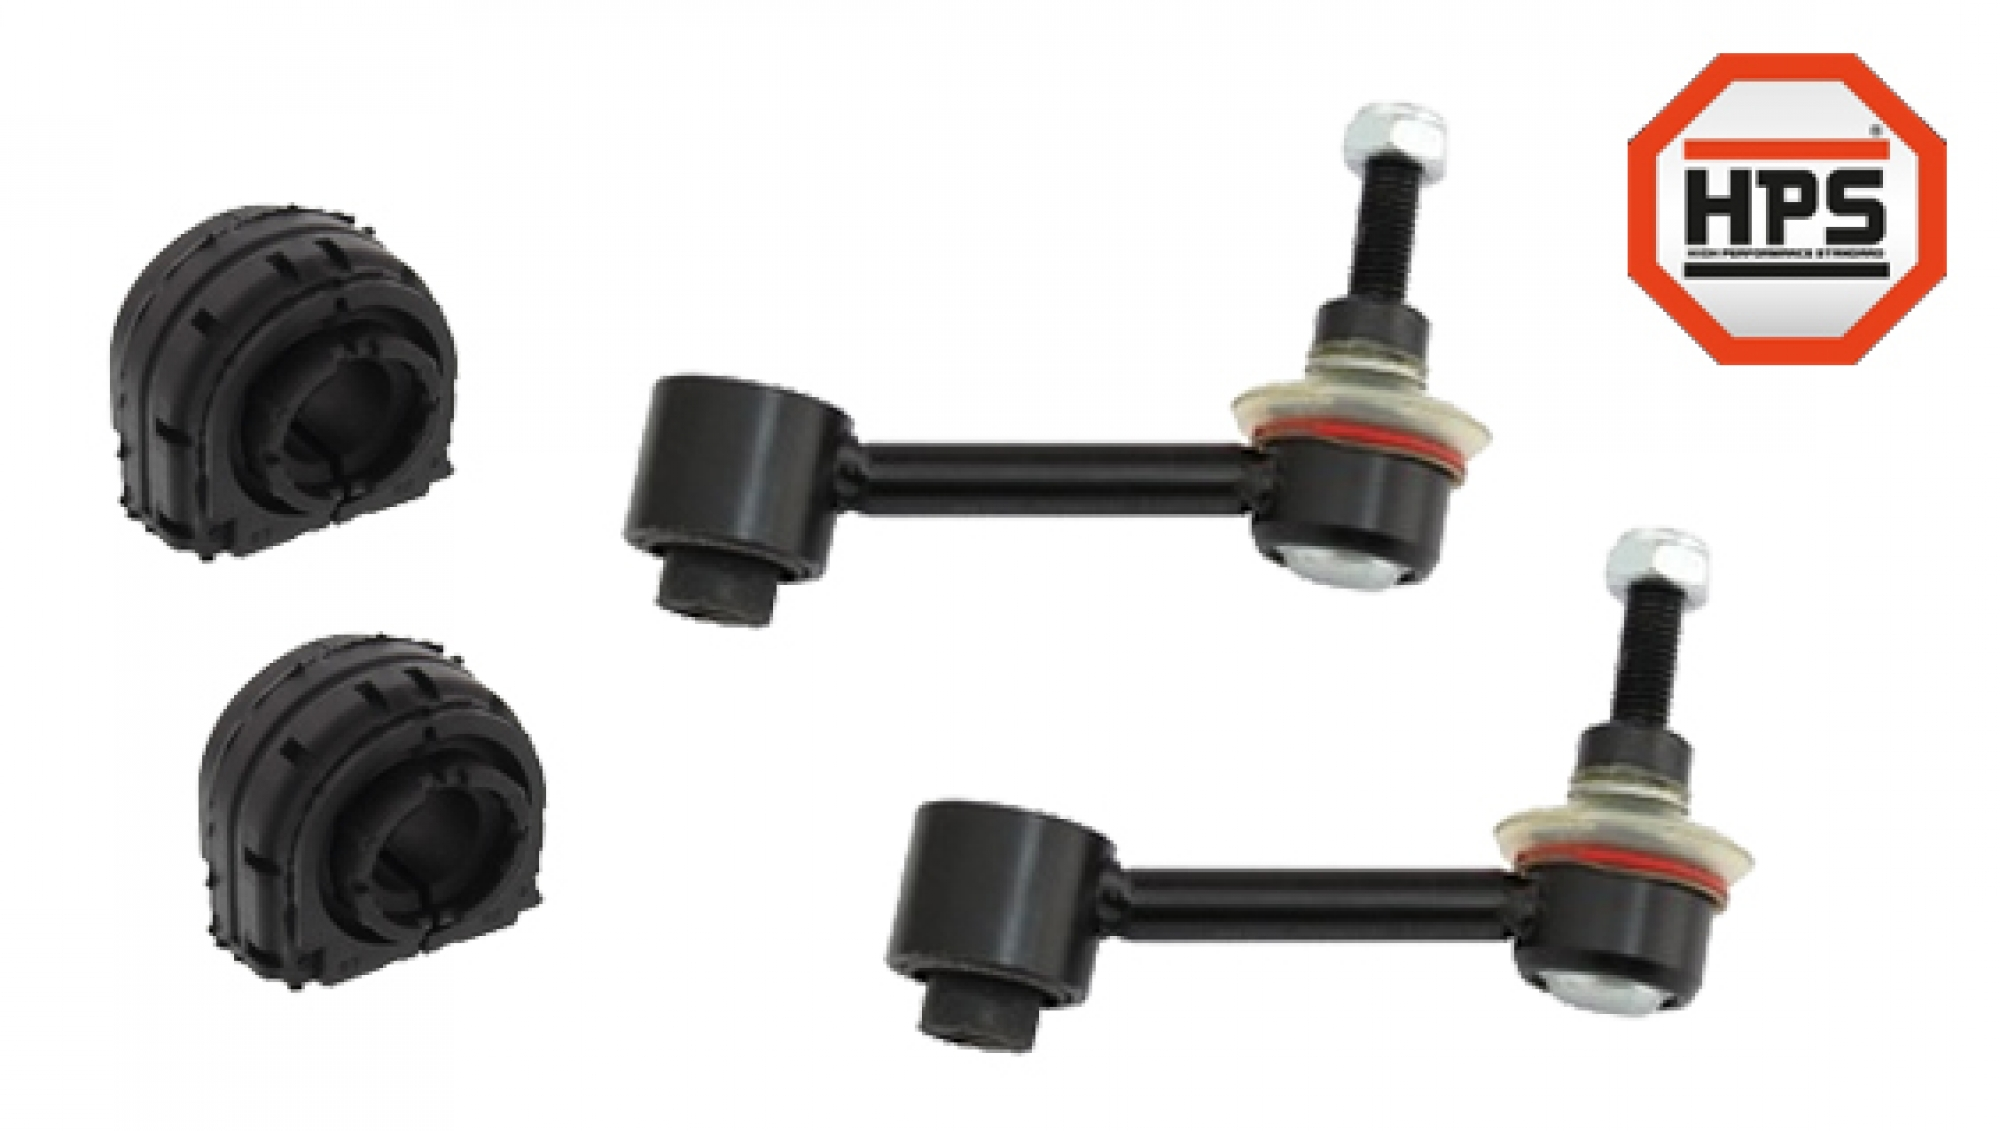 2x Koppelstange Stabistrebe Pendelstütze Verstärkt HPS vorne für Citroen Peugeot